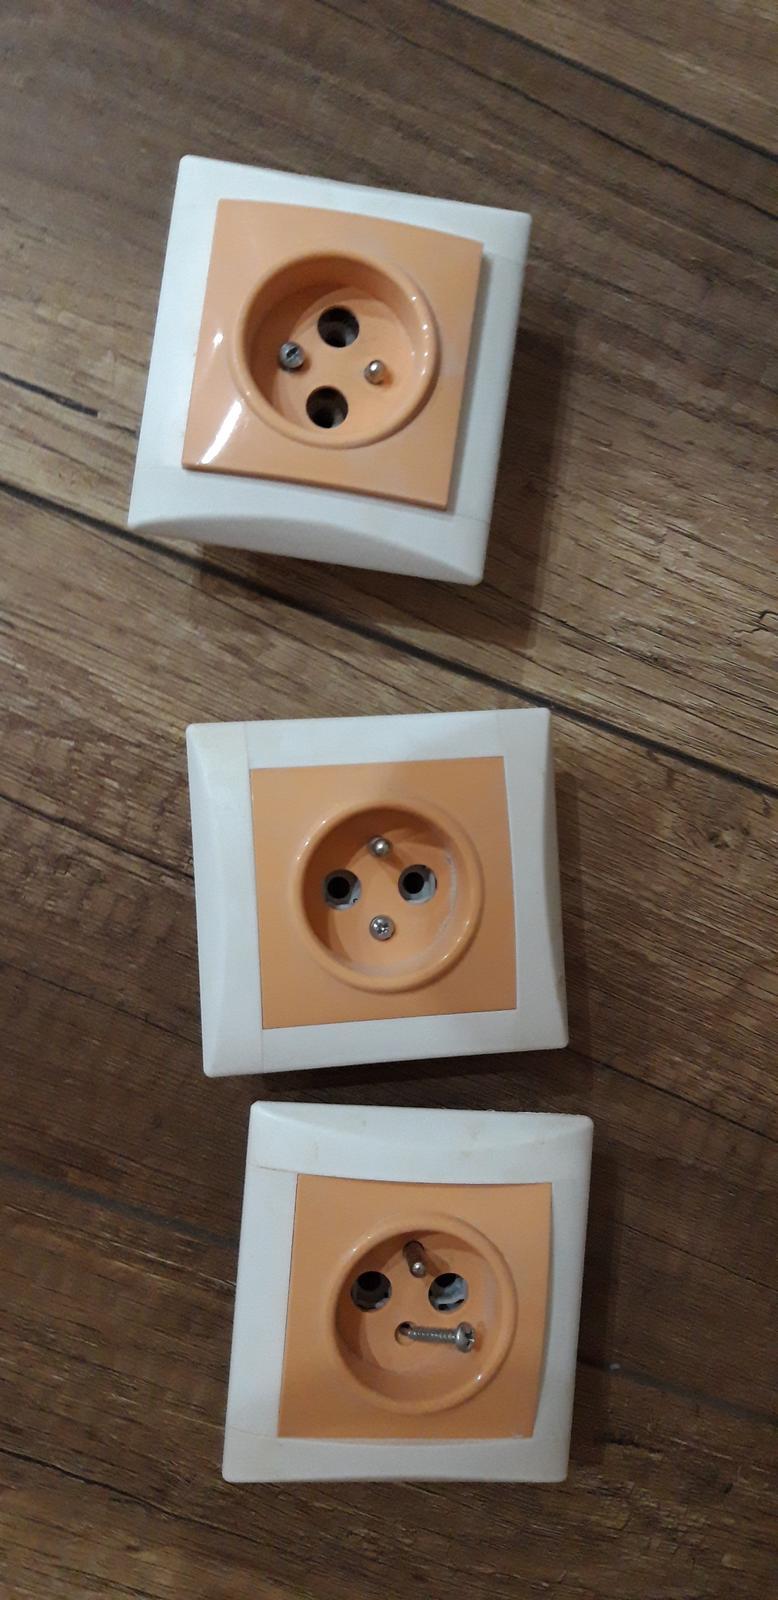 Jednozasuvka oranzova - Obrázok č. 1